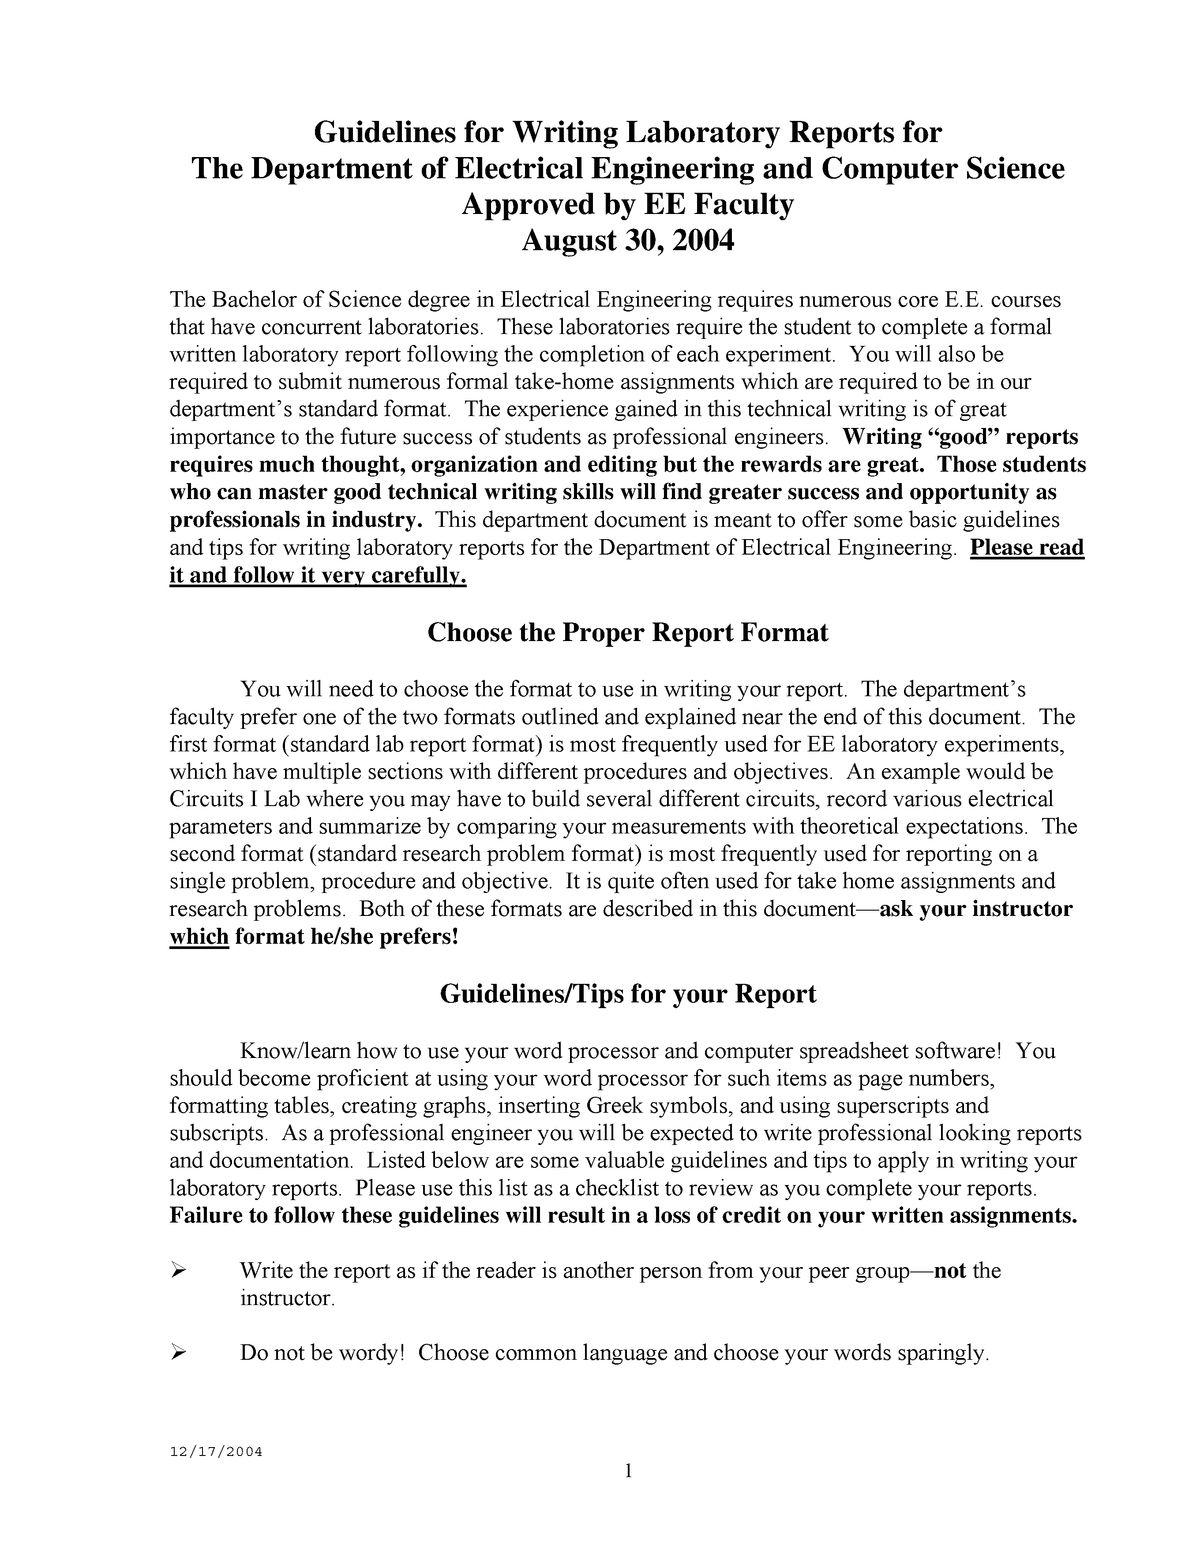 Lab Report Format Ecte290 Uow Studocu With Engineering Lab